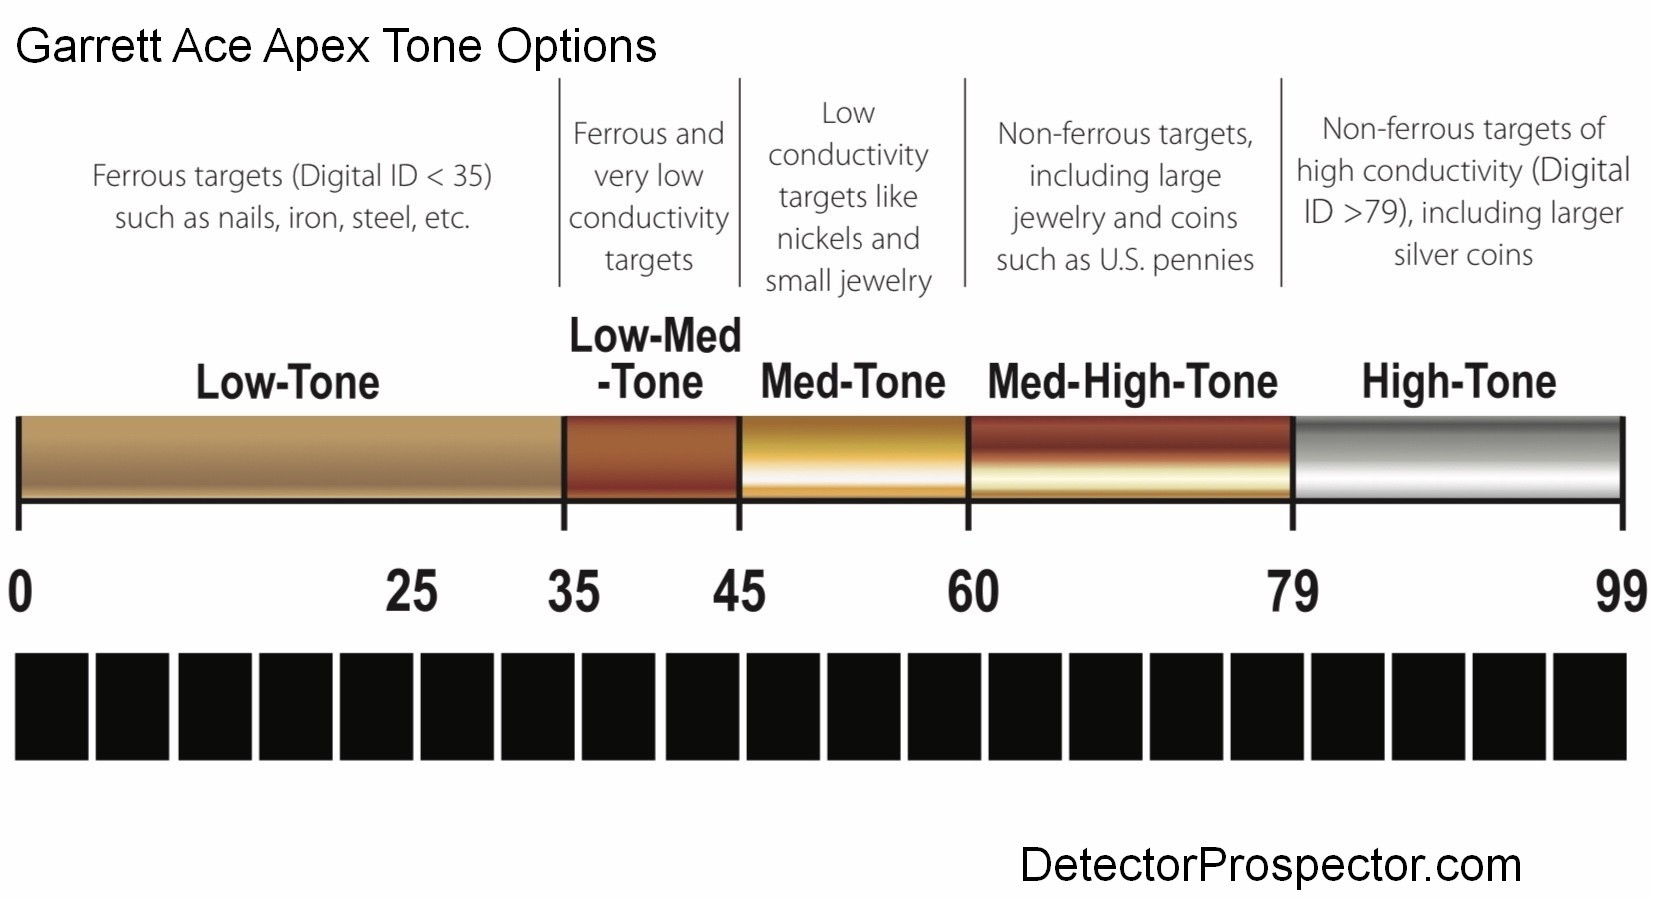 garrett-ace-apex-tone-options.jpg